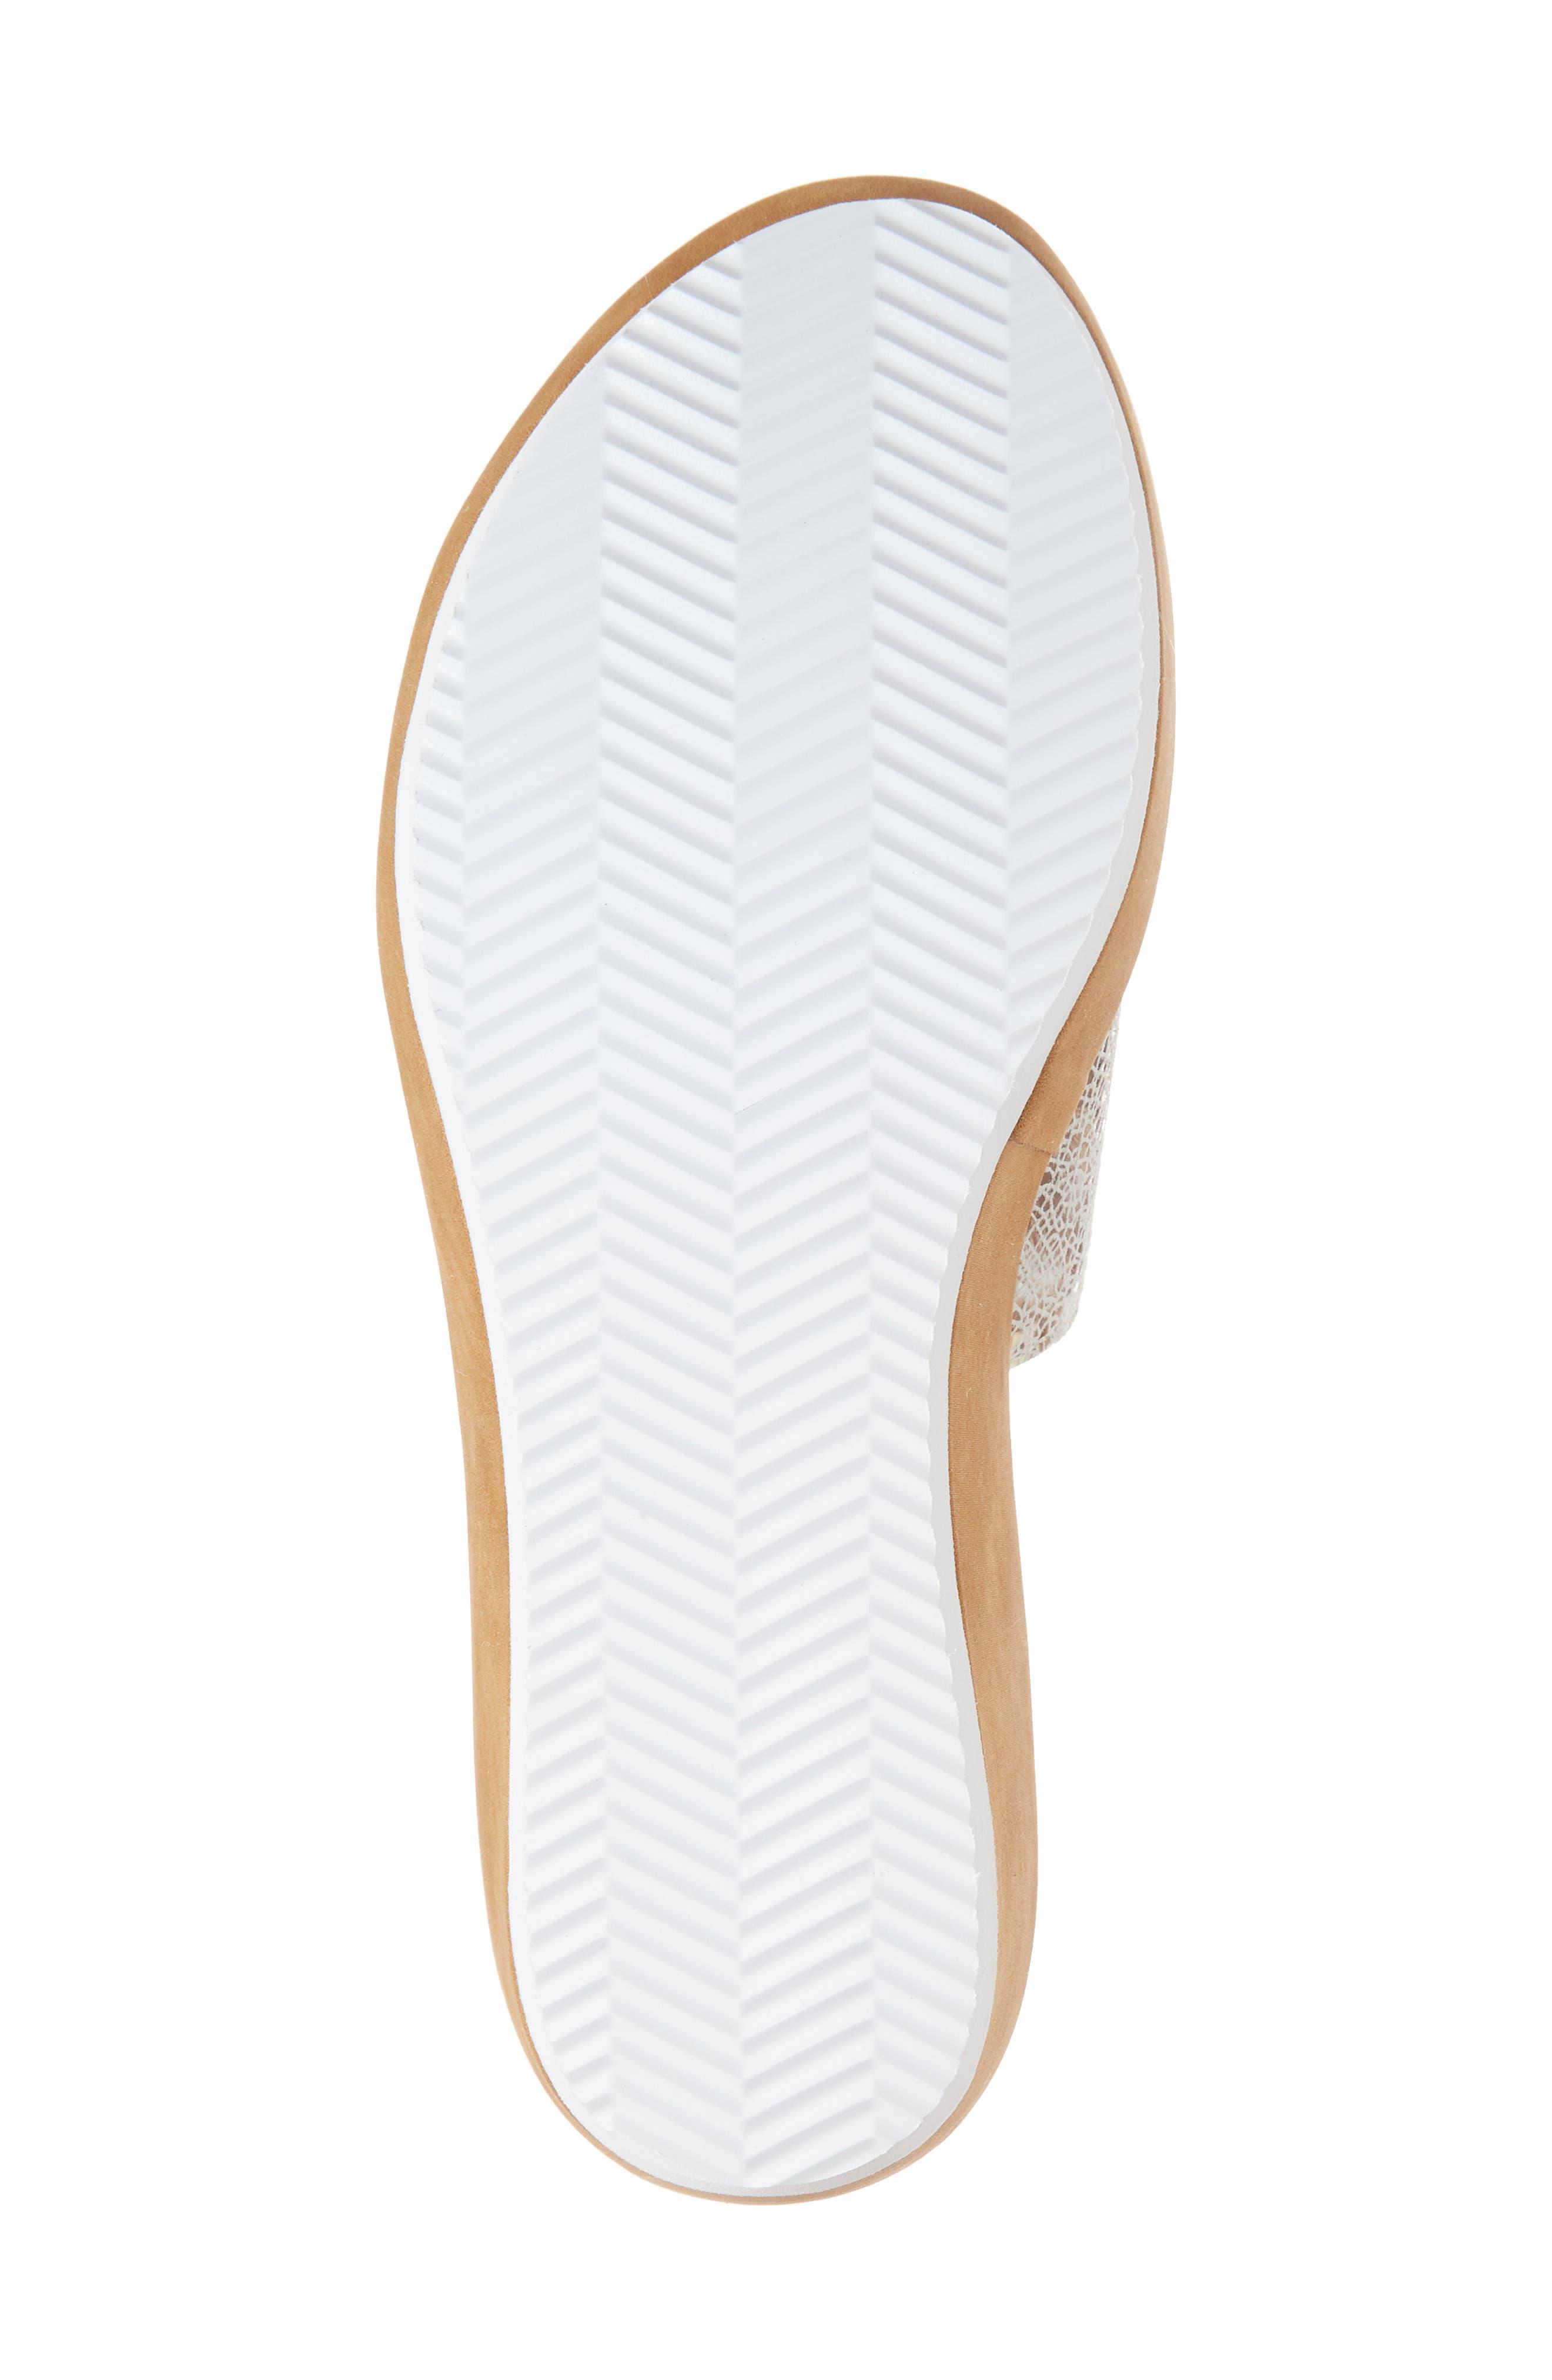 Tania Platform Wedge Slide Sandal,                             Alternate thumbnail 6, color,                             Taupe Leather